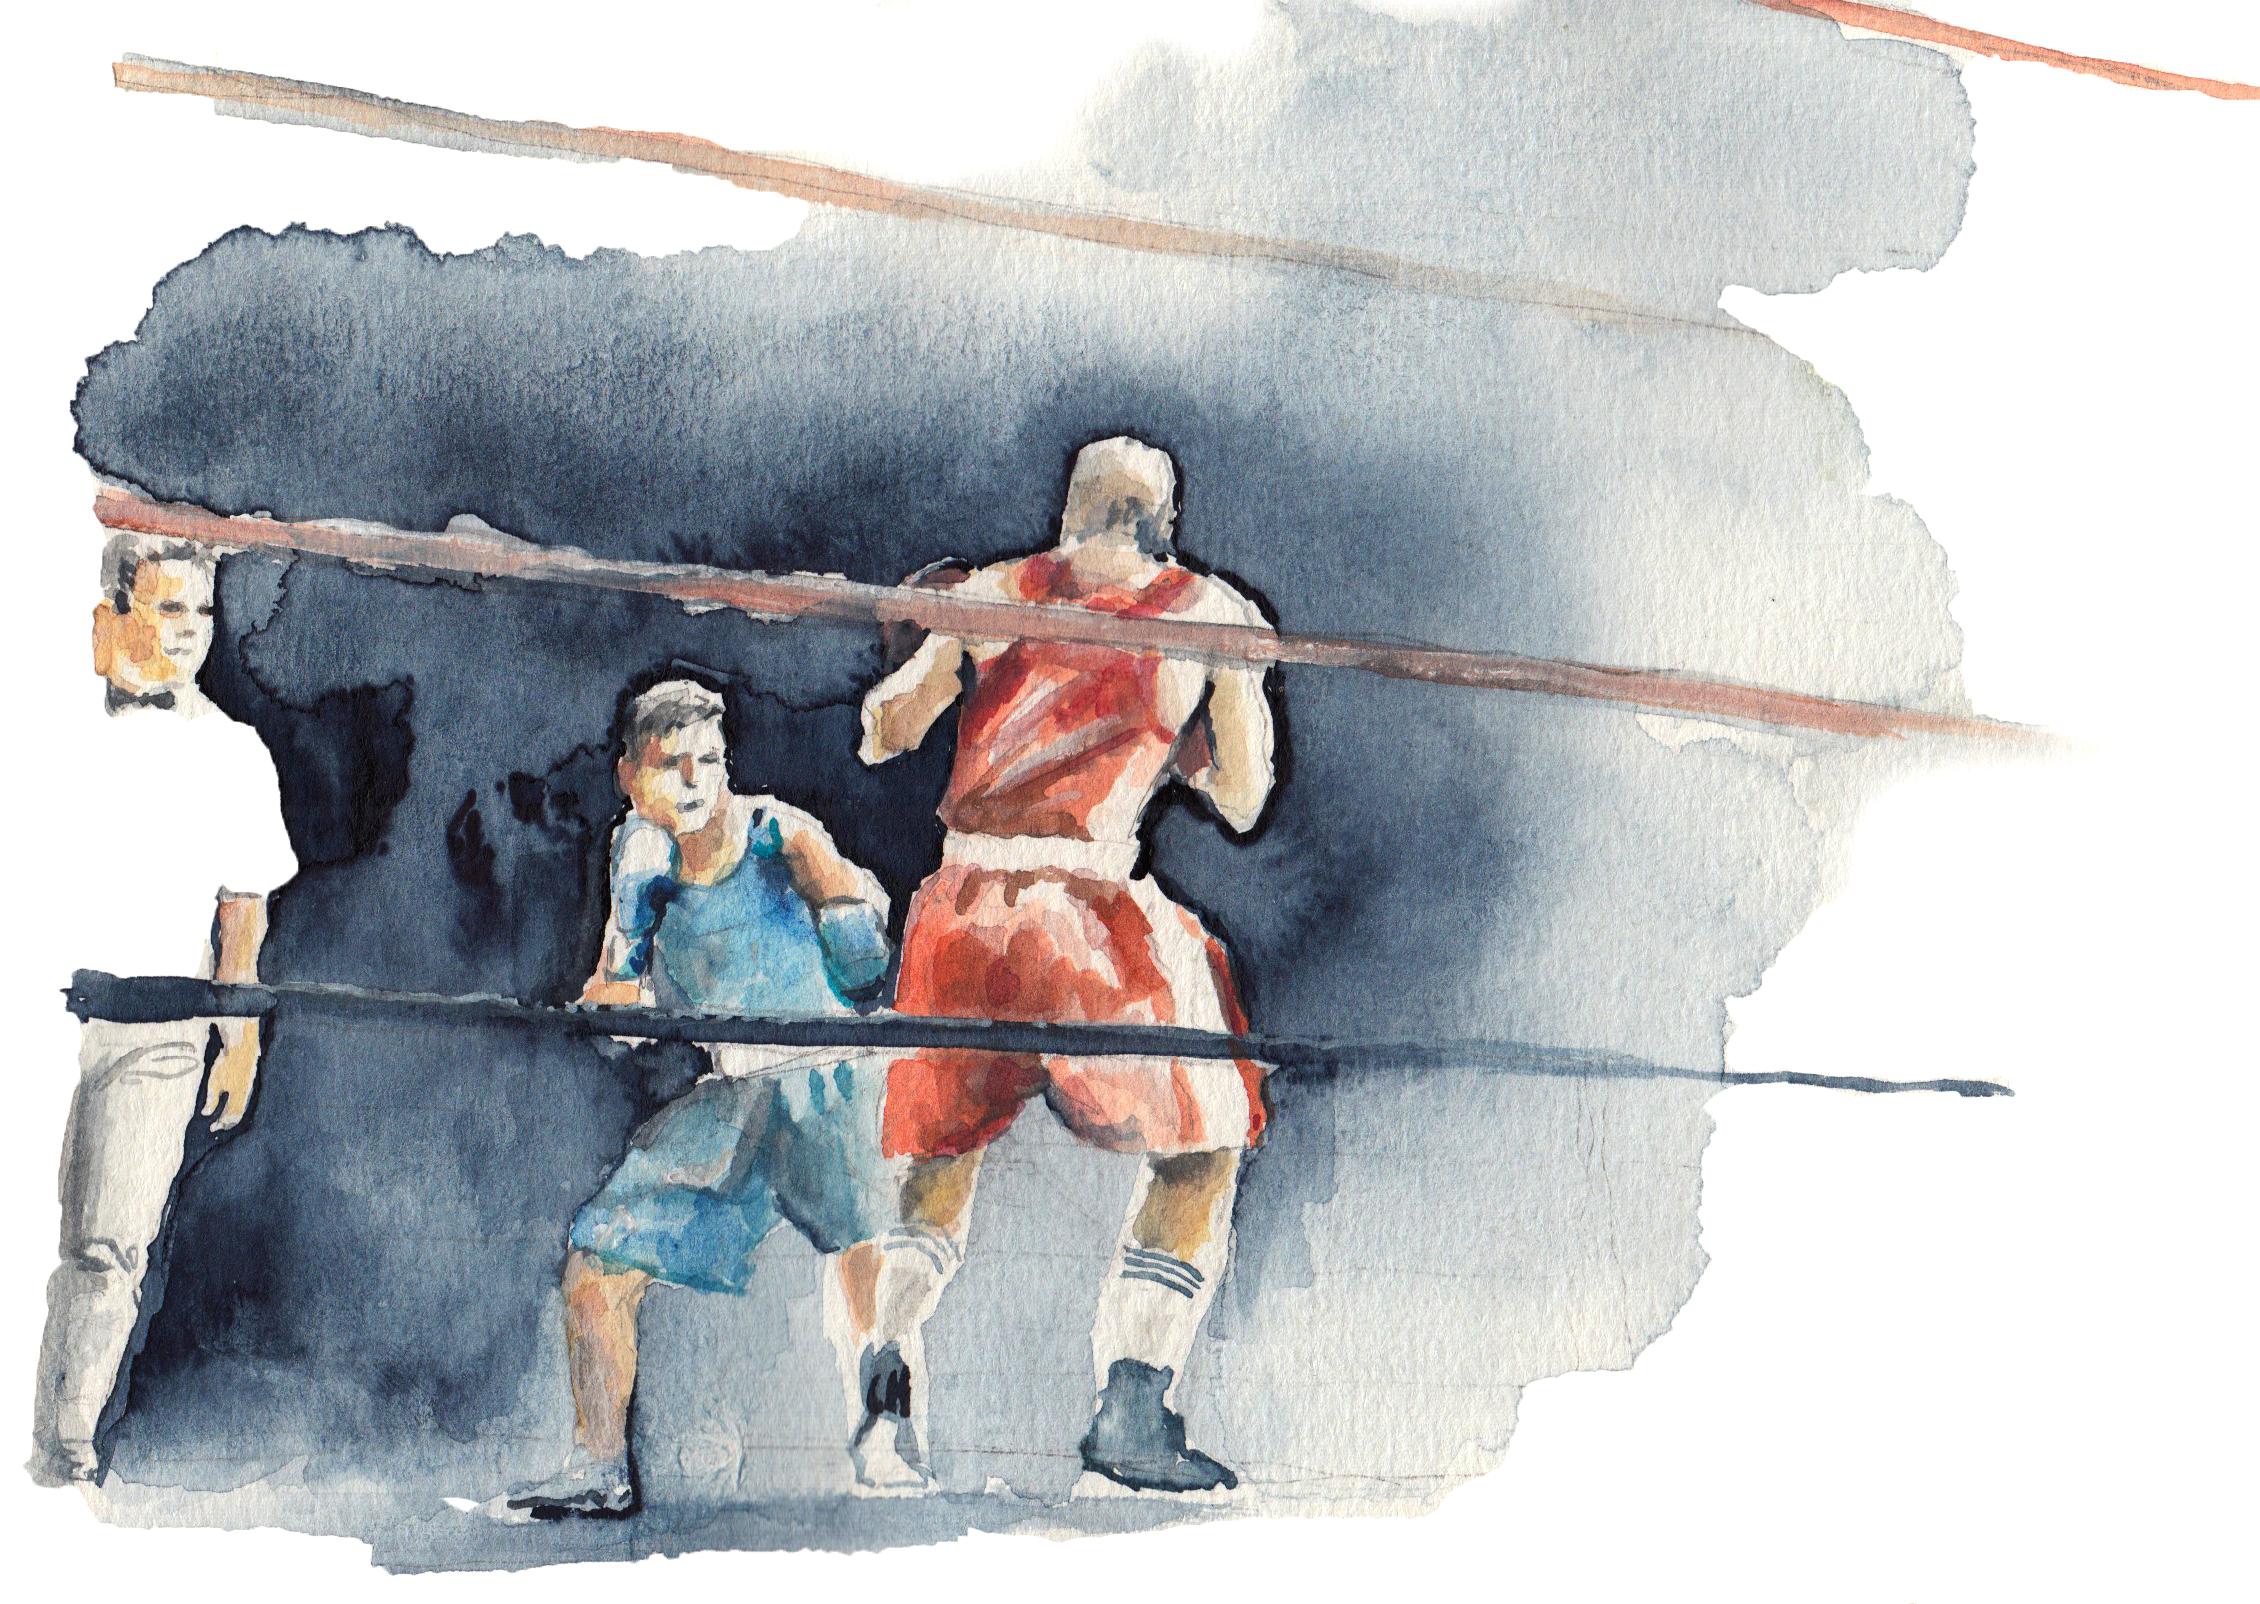 Boxer 2 / 2018 / Acryl und Aquarell auf Papier / 14 x 30 cm